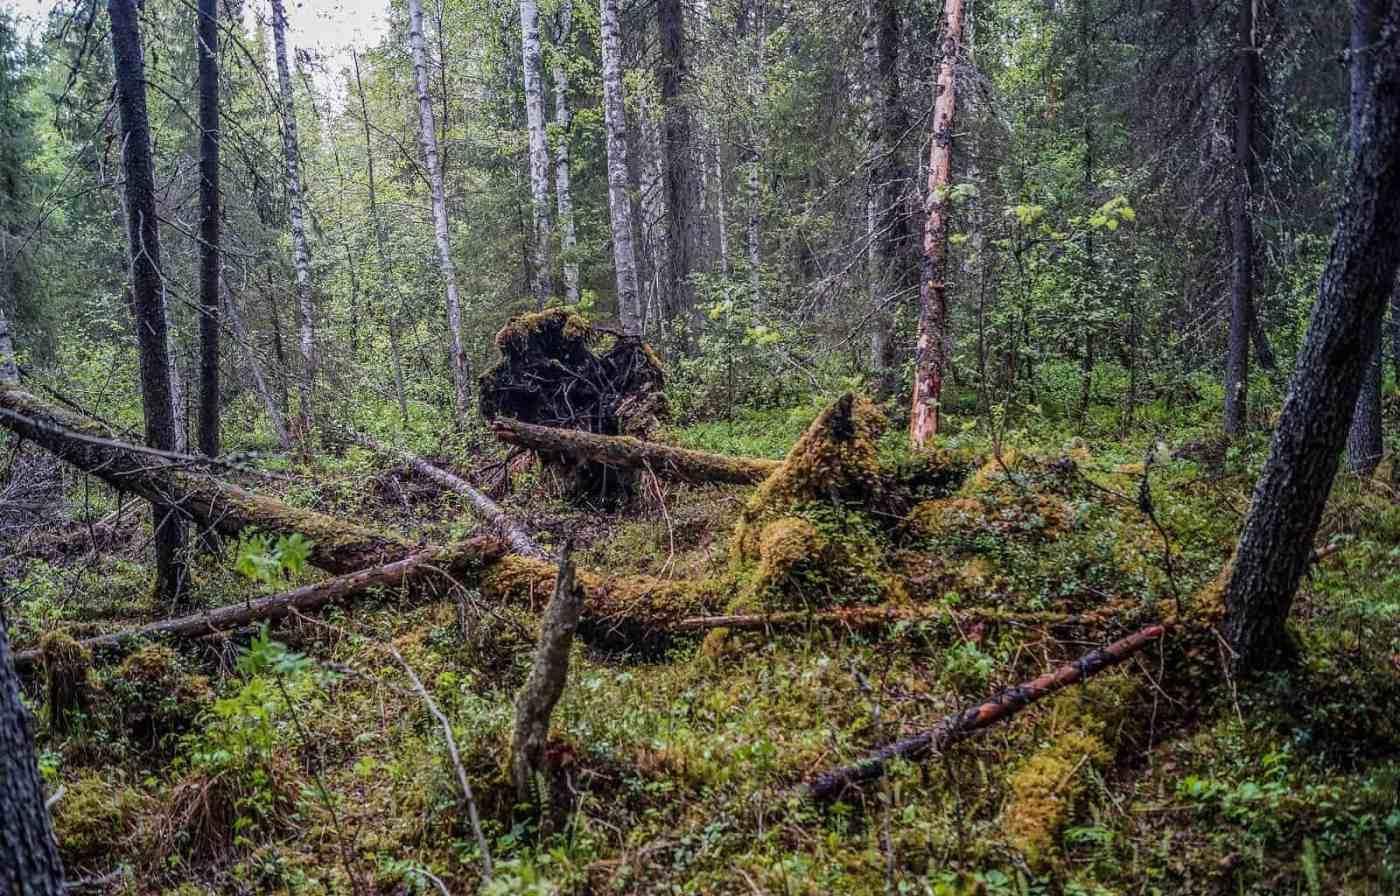 Archangelsk-21882.JPG - © European Wilderness Society CC BY-NC-ND 4.0